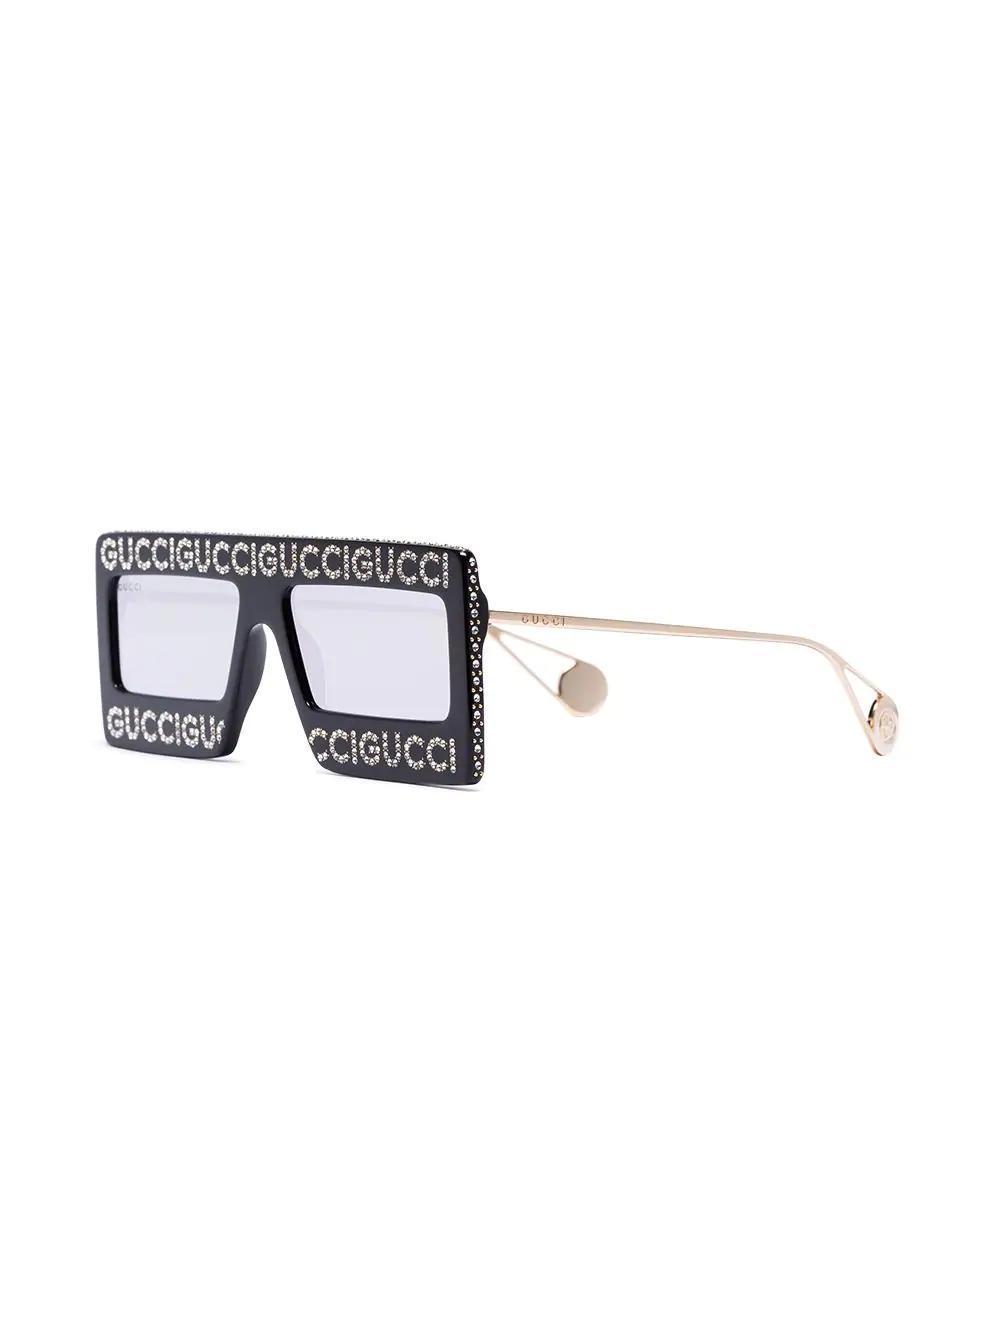 GUCCI EYEWEAR 水钻铆钉logo方框有色太阳眼镜